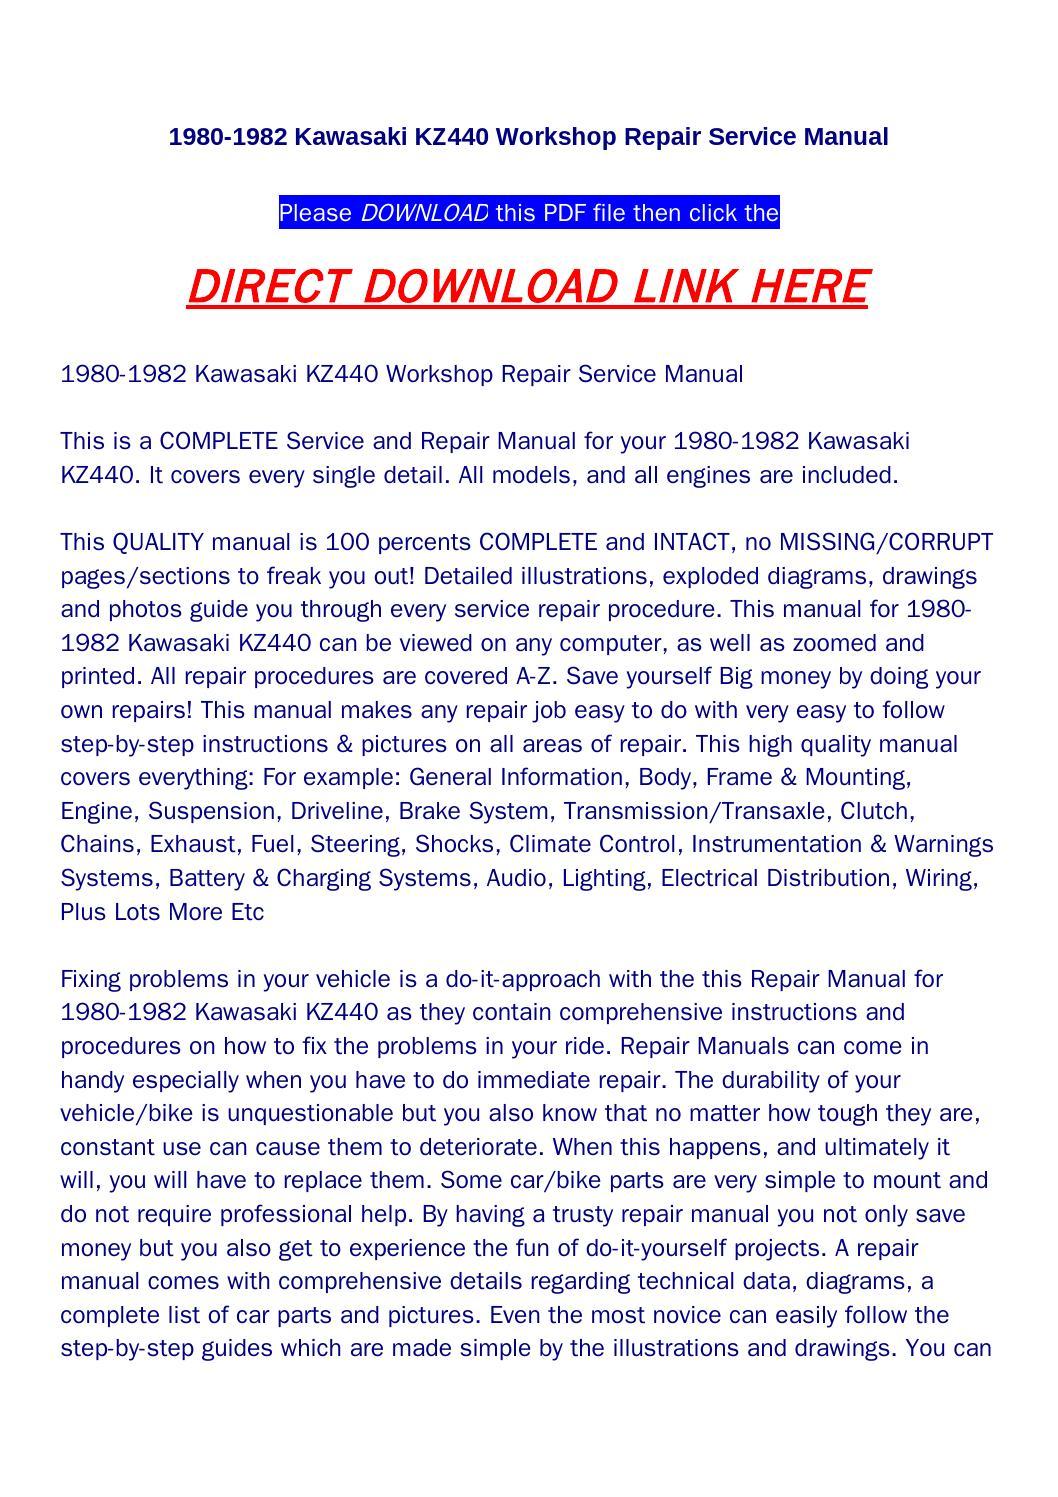 Kawasaki Kz440 Manual pdf